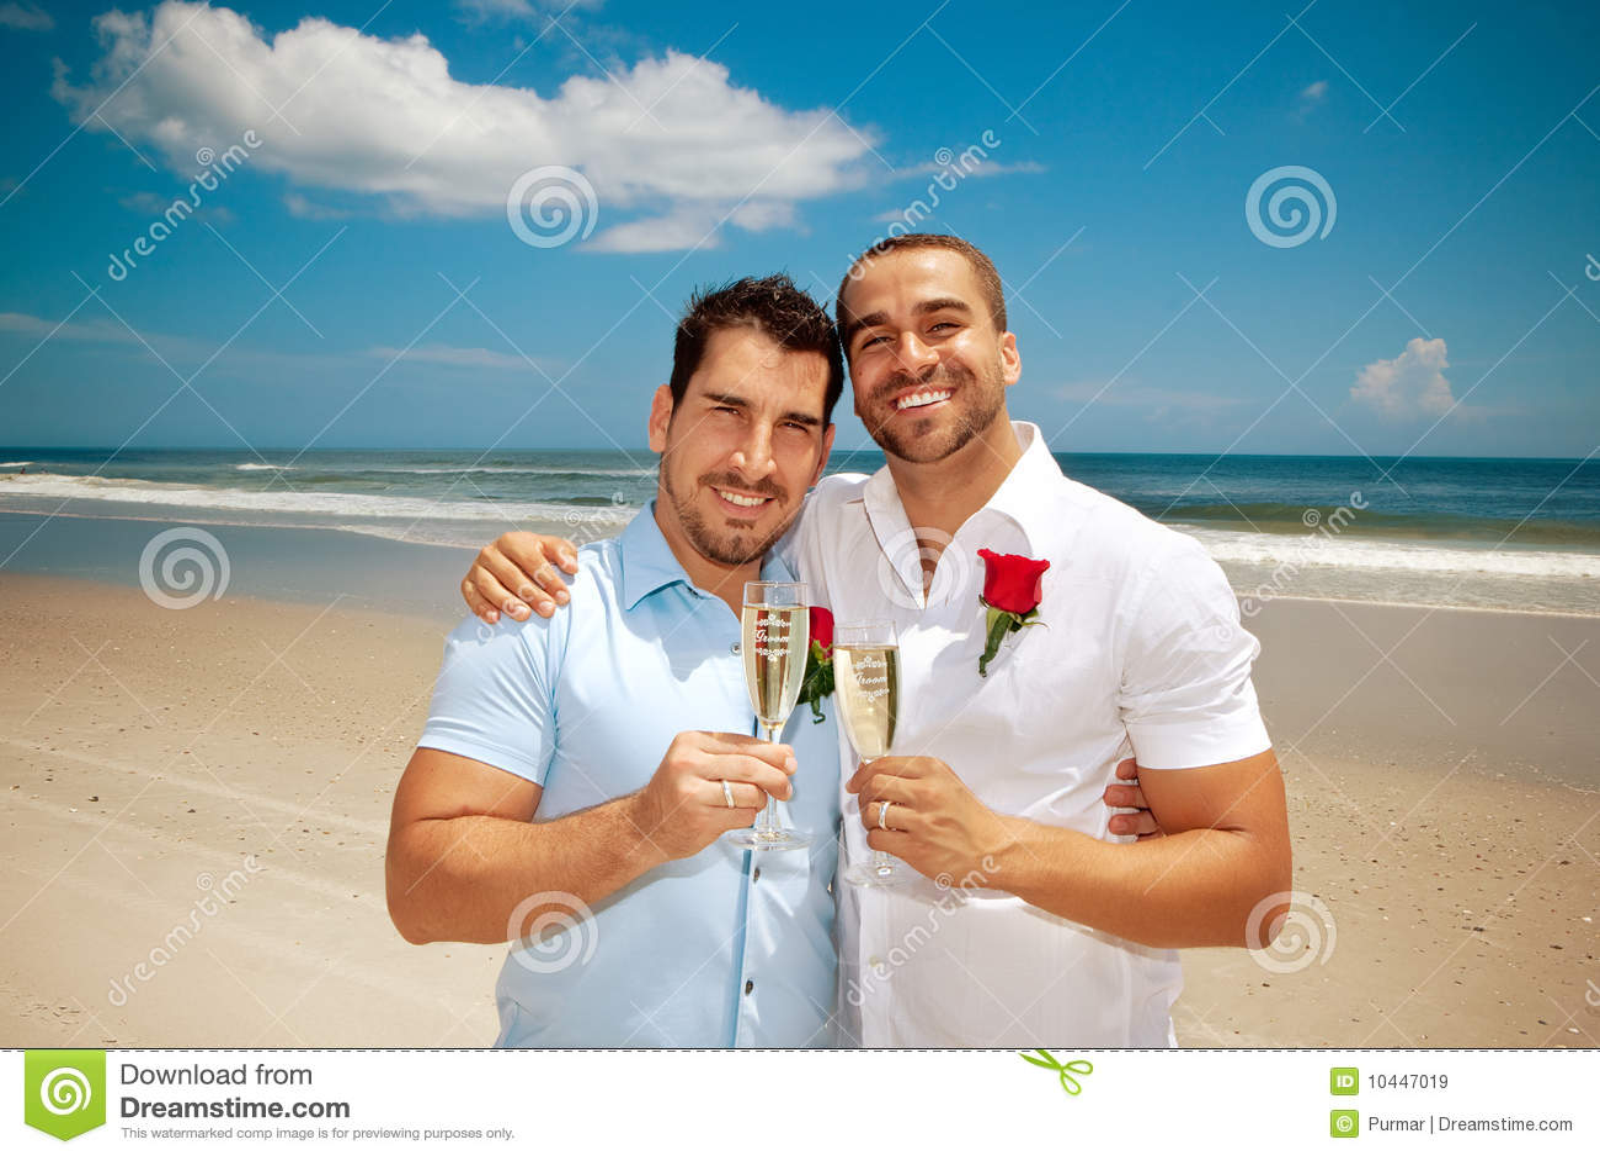 from Khalil gay videos on beach